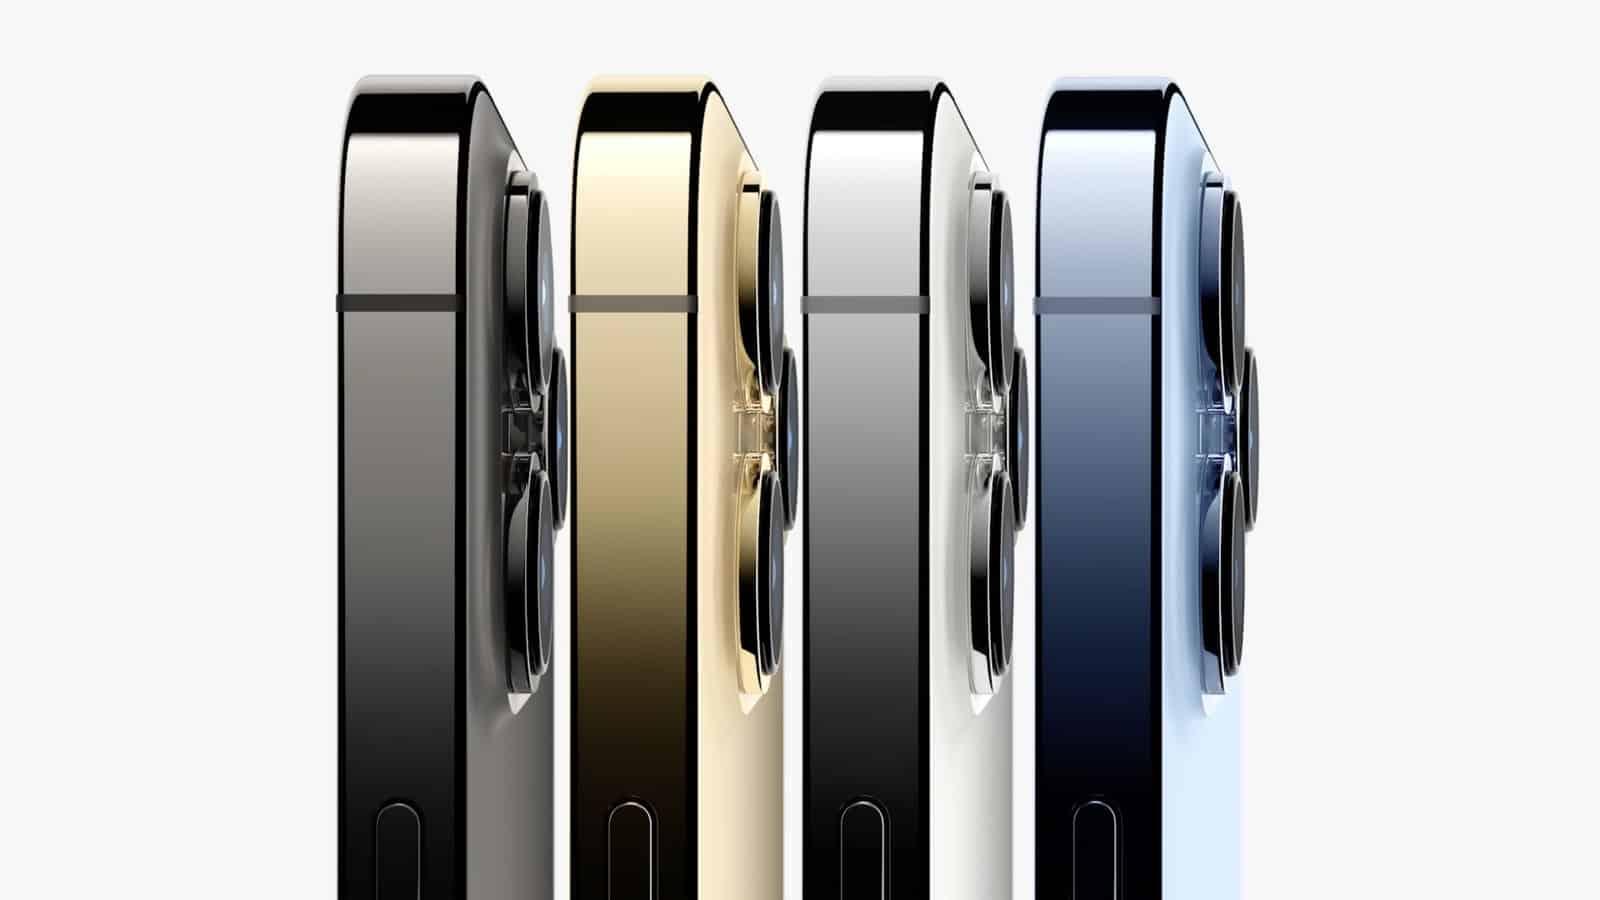 Apple iPhone 13 Apple iPhone 13 Pro Apple Watch Series 7 iPad Mini